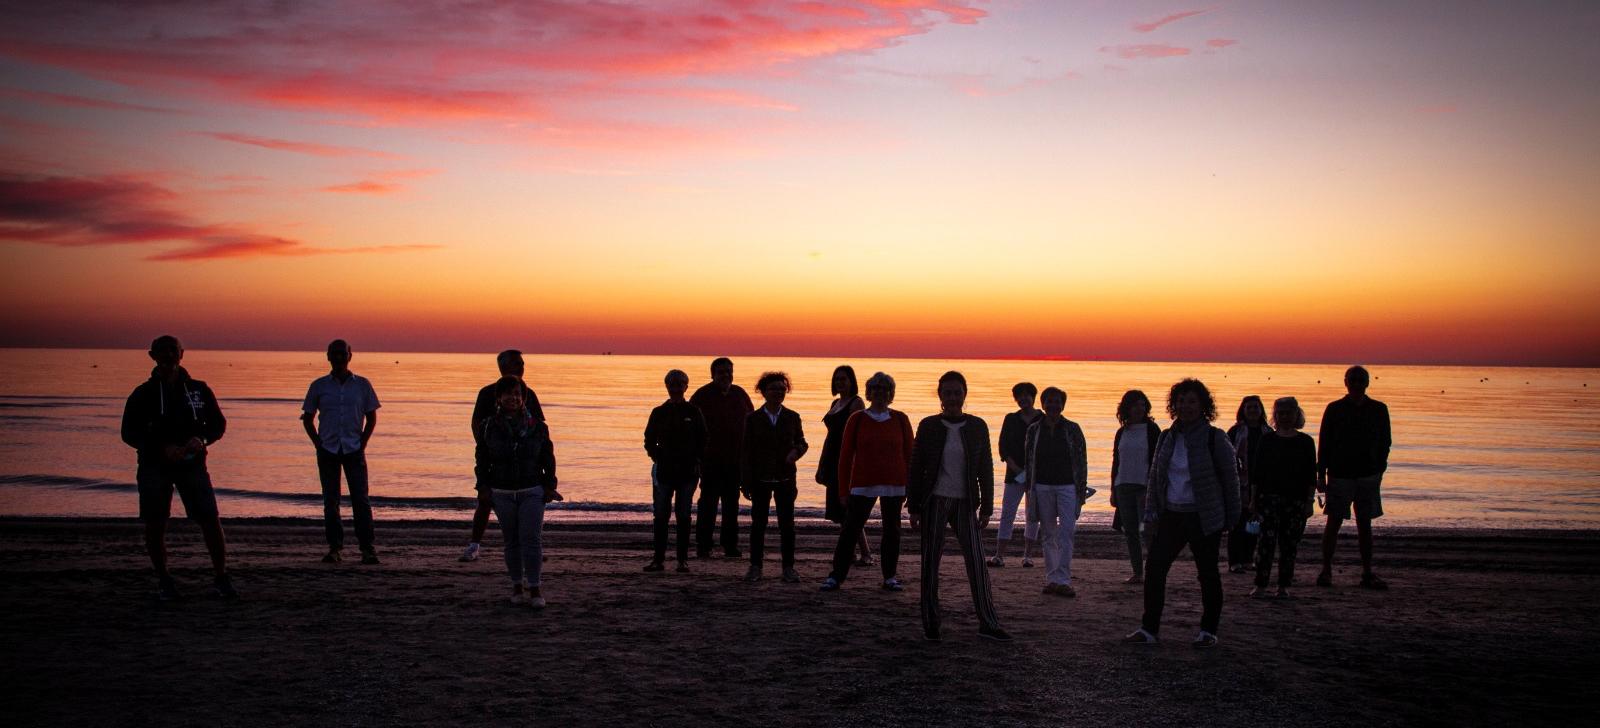 Sunrise on the beach (before a concert)